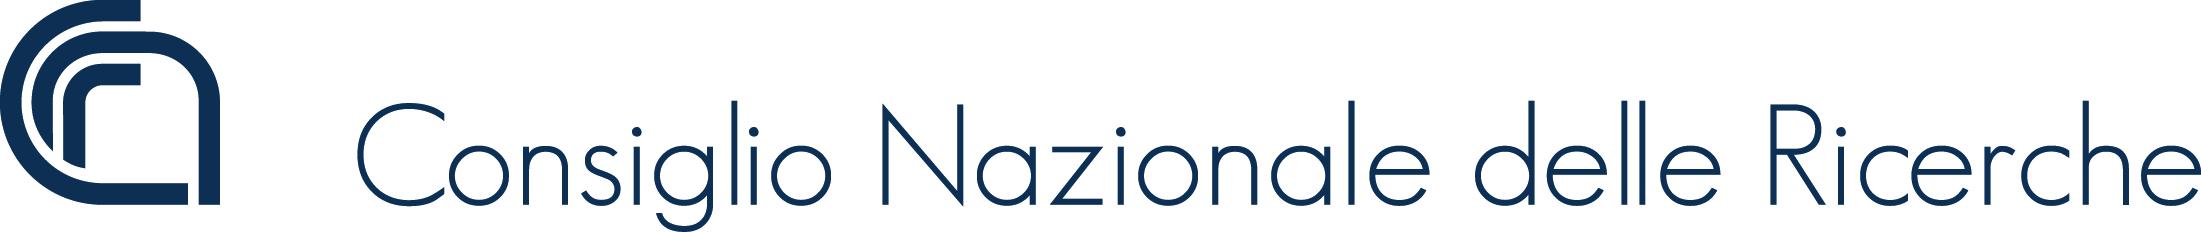 NUOVO logo CNR